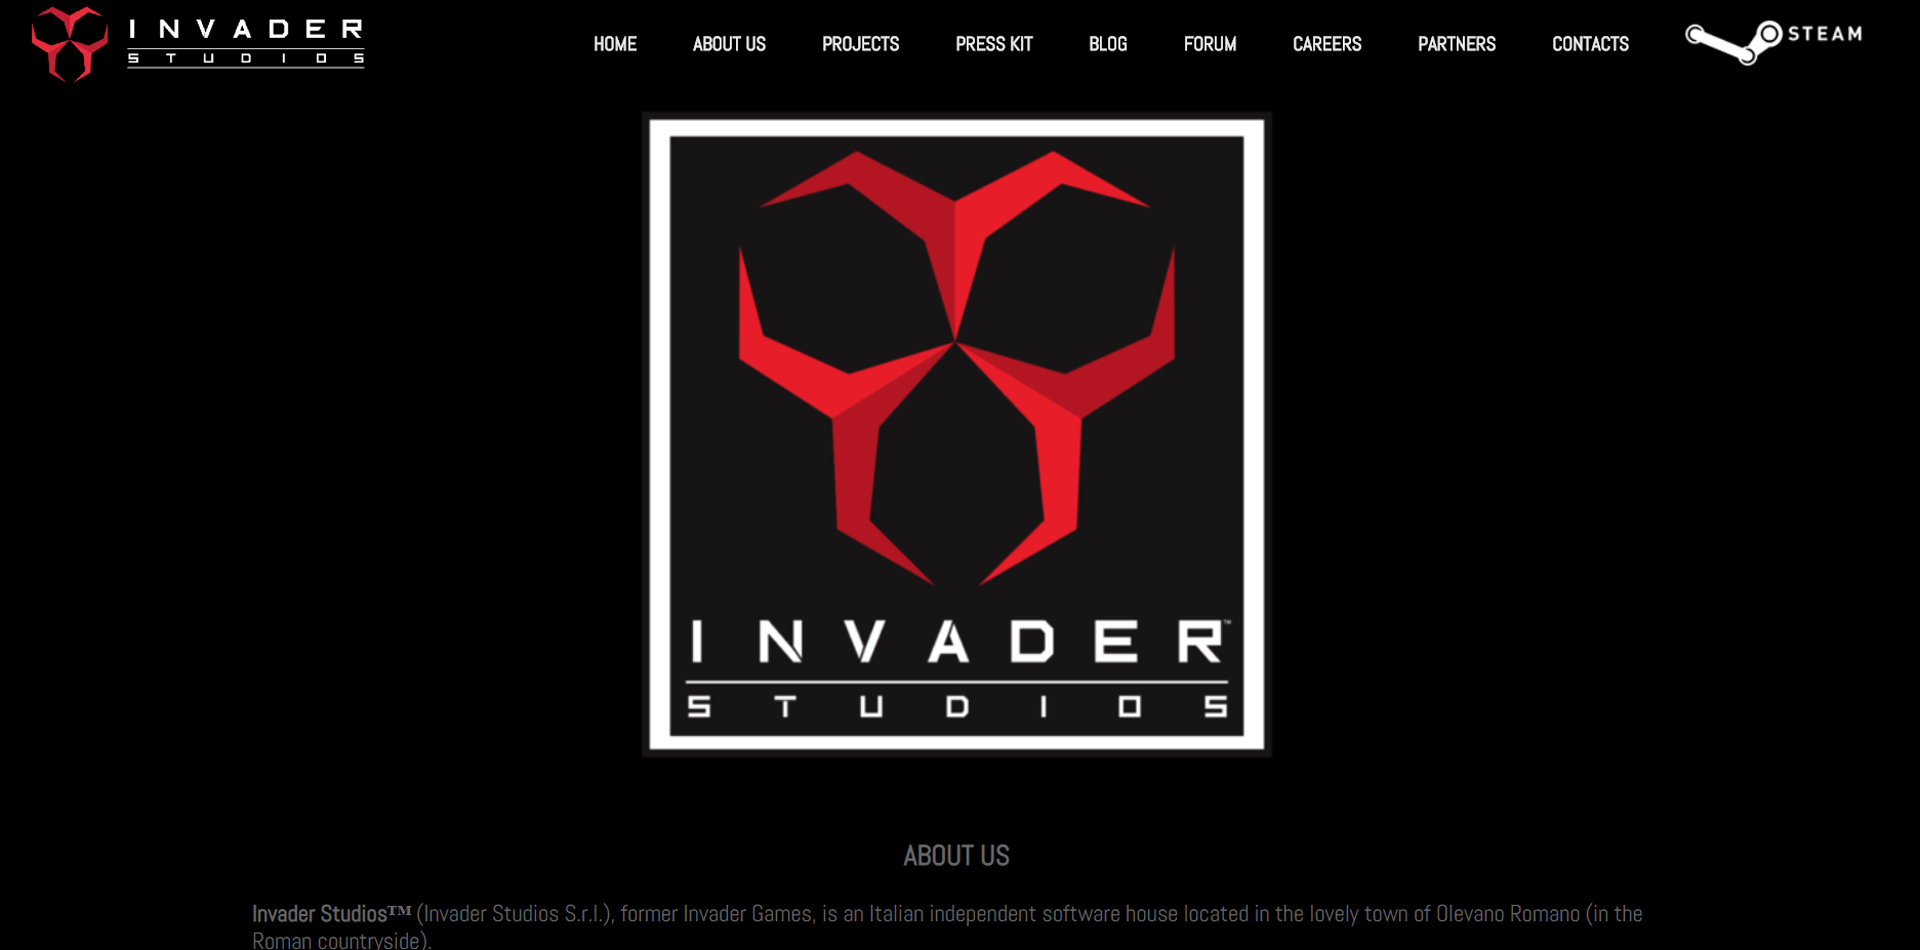 Invader Studios - Gianluca De Bianchi - Jeanzilla